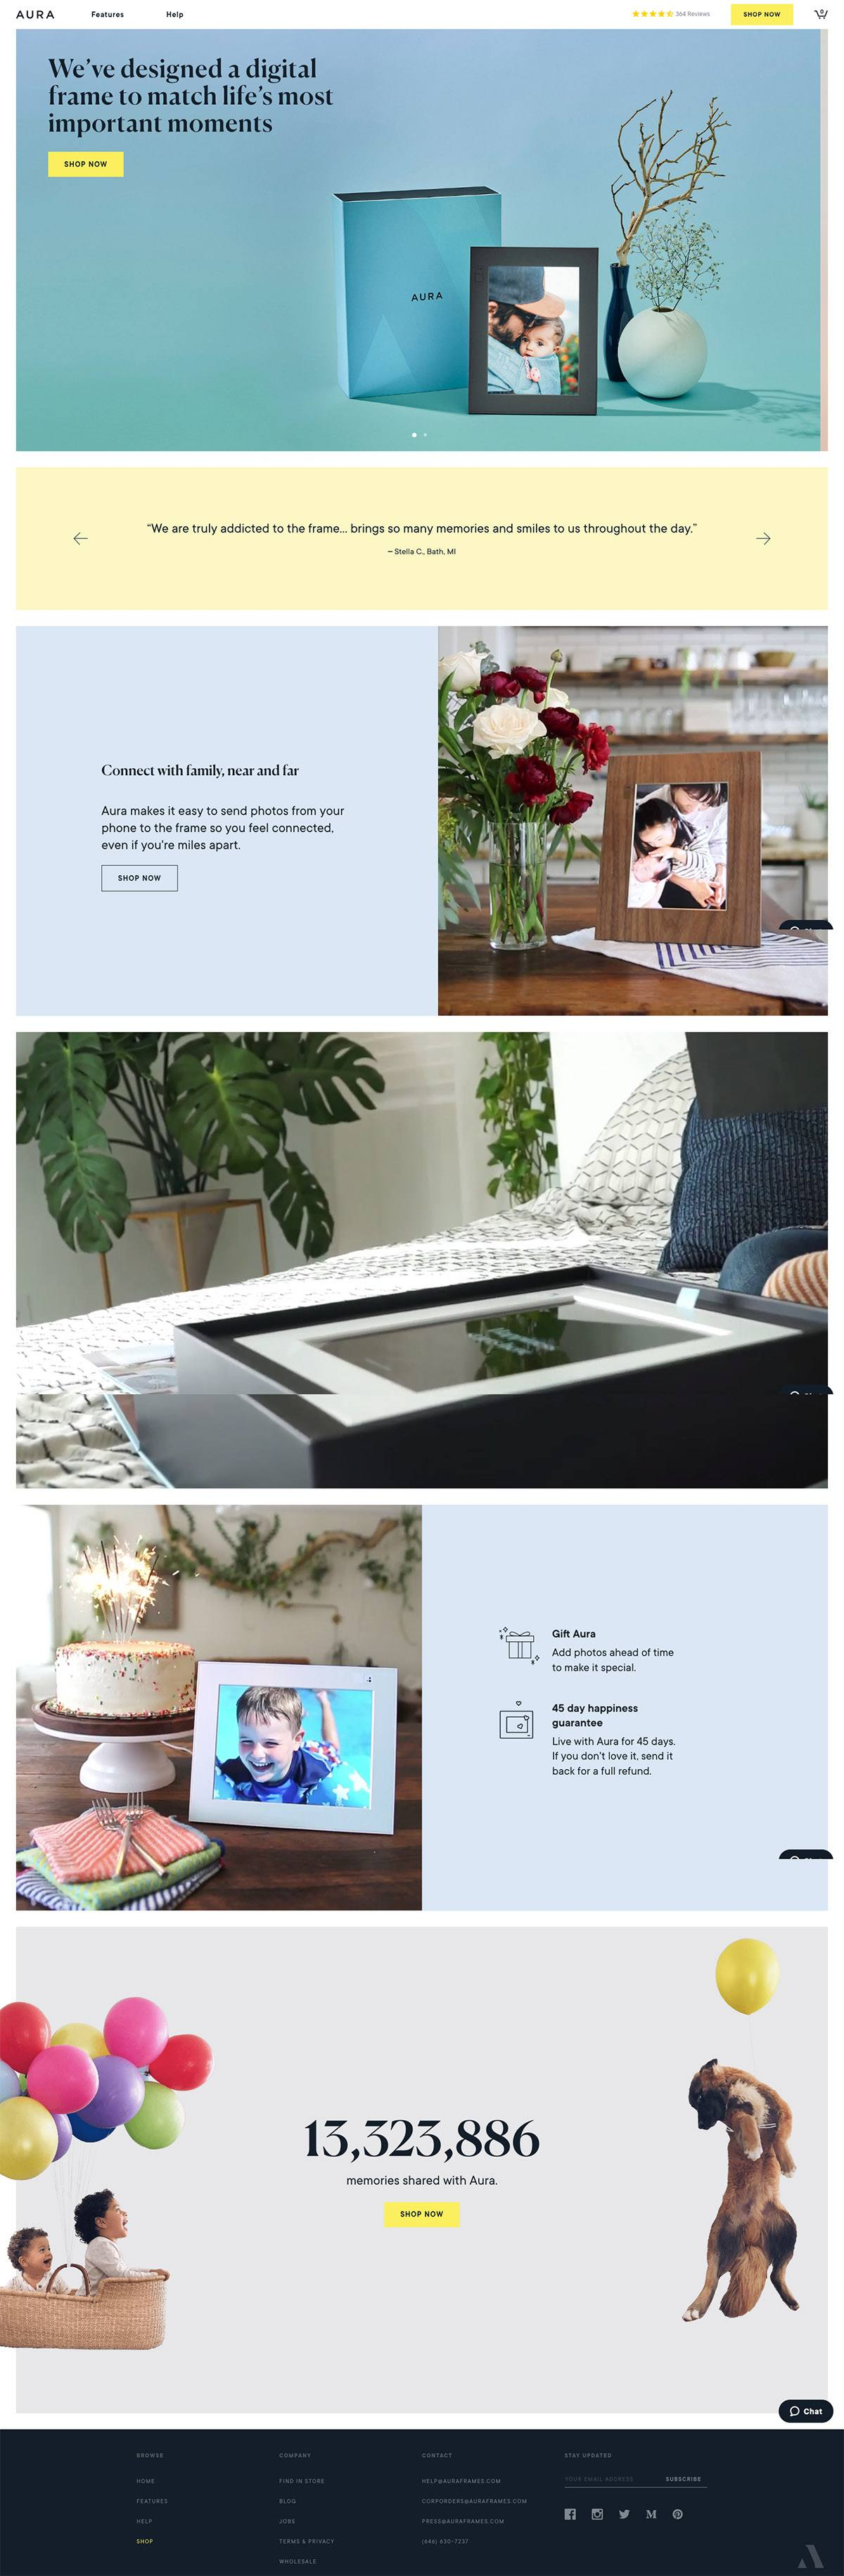 eCommerce website: Aura